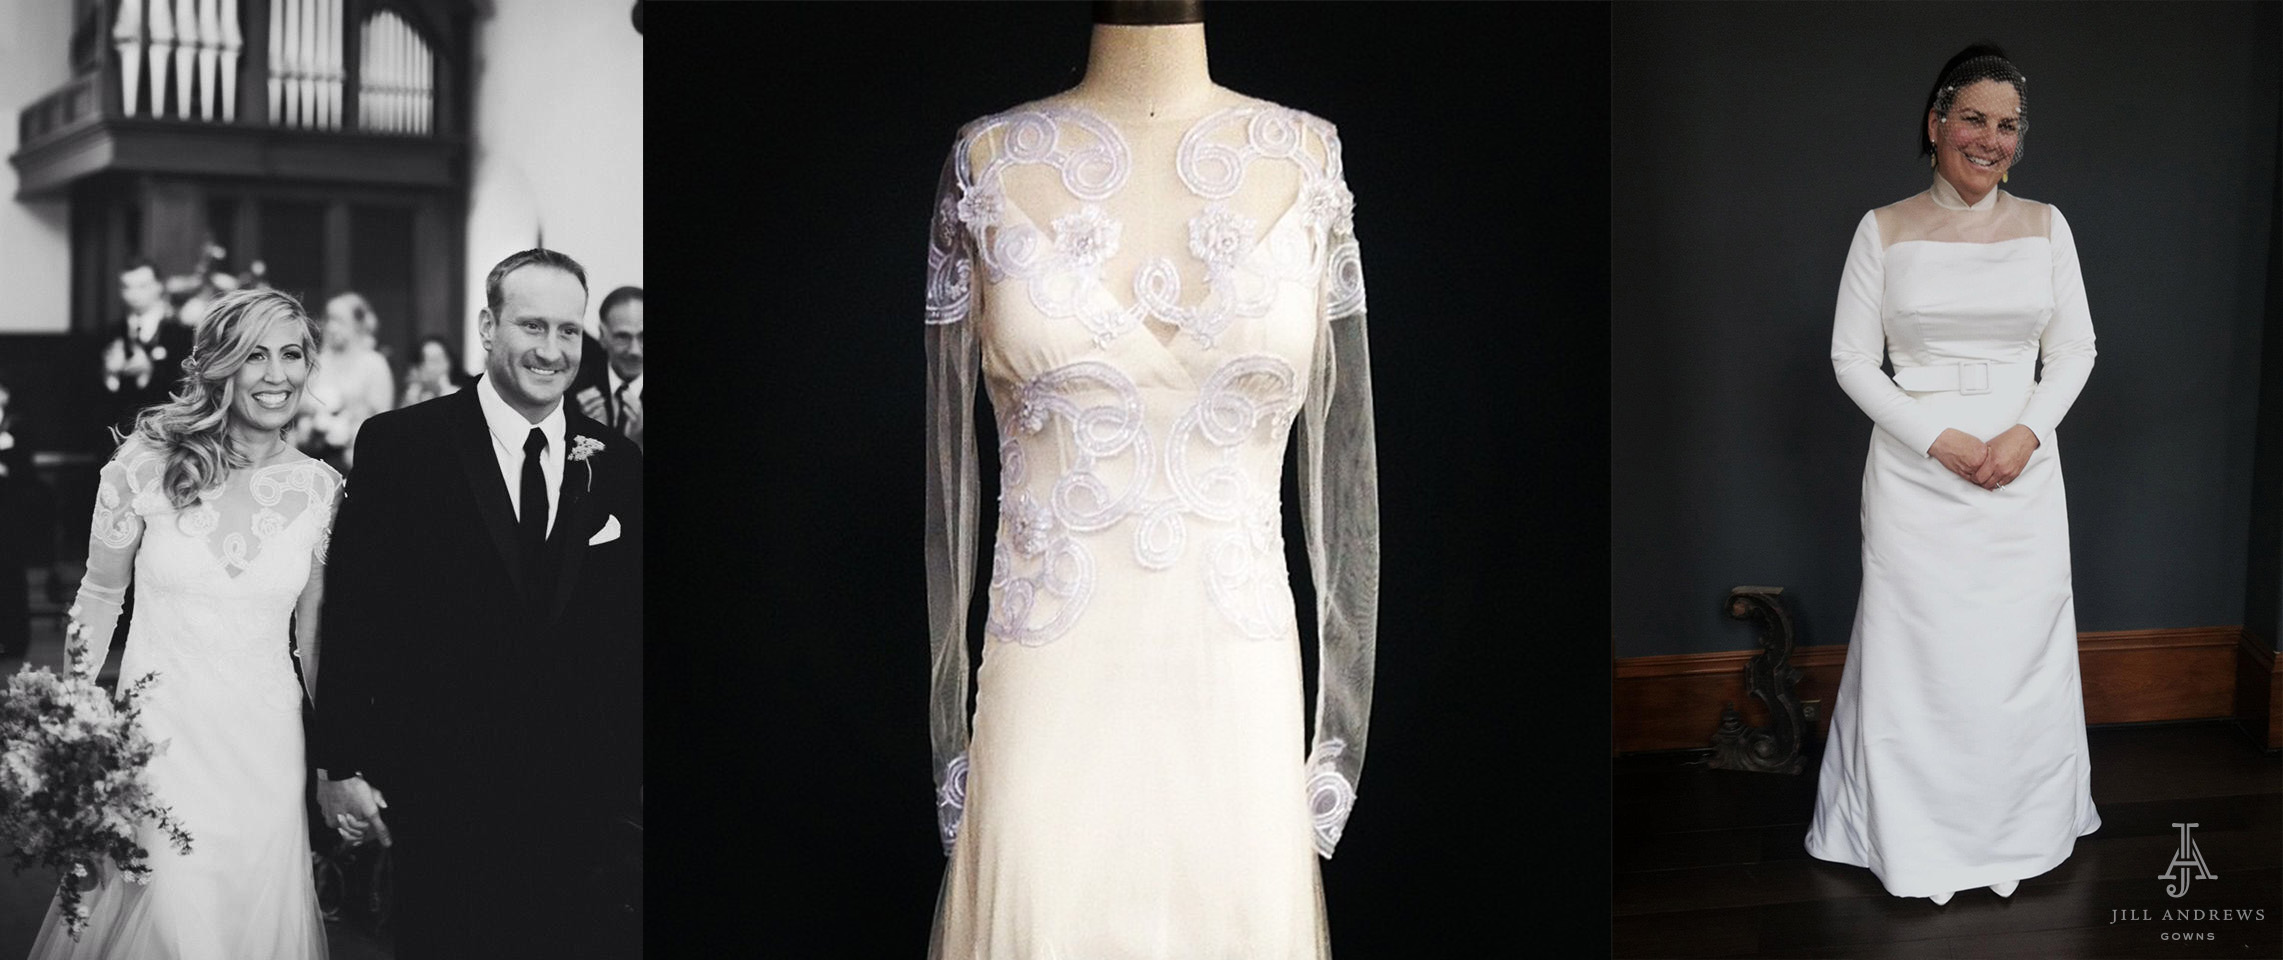 September brides in custom wedding dresses with long sleeves